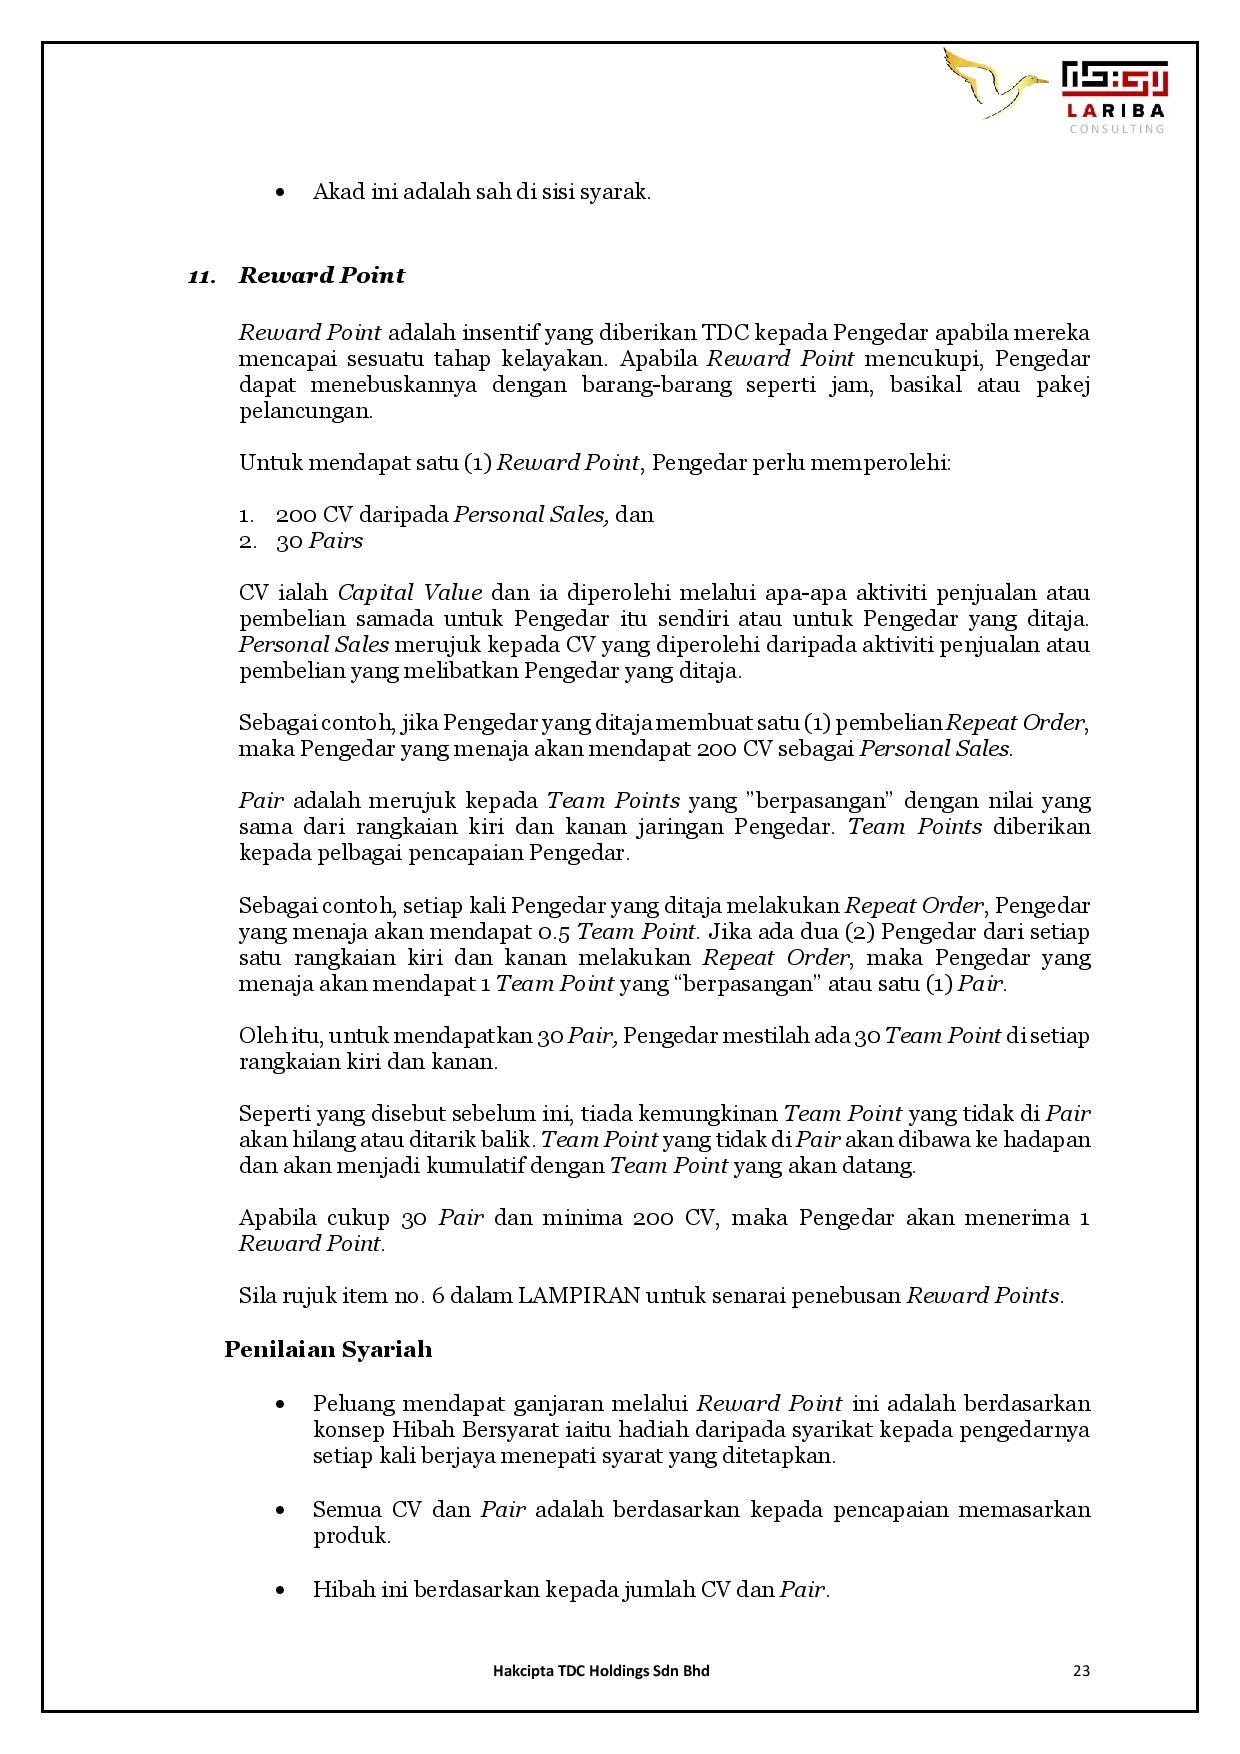 Huraian Penilaian Syariah TDC 210121 (1)-page-023